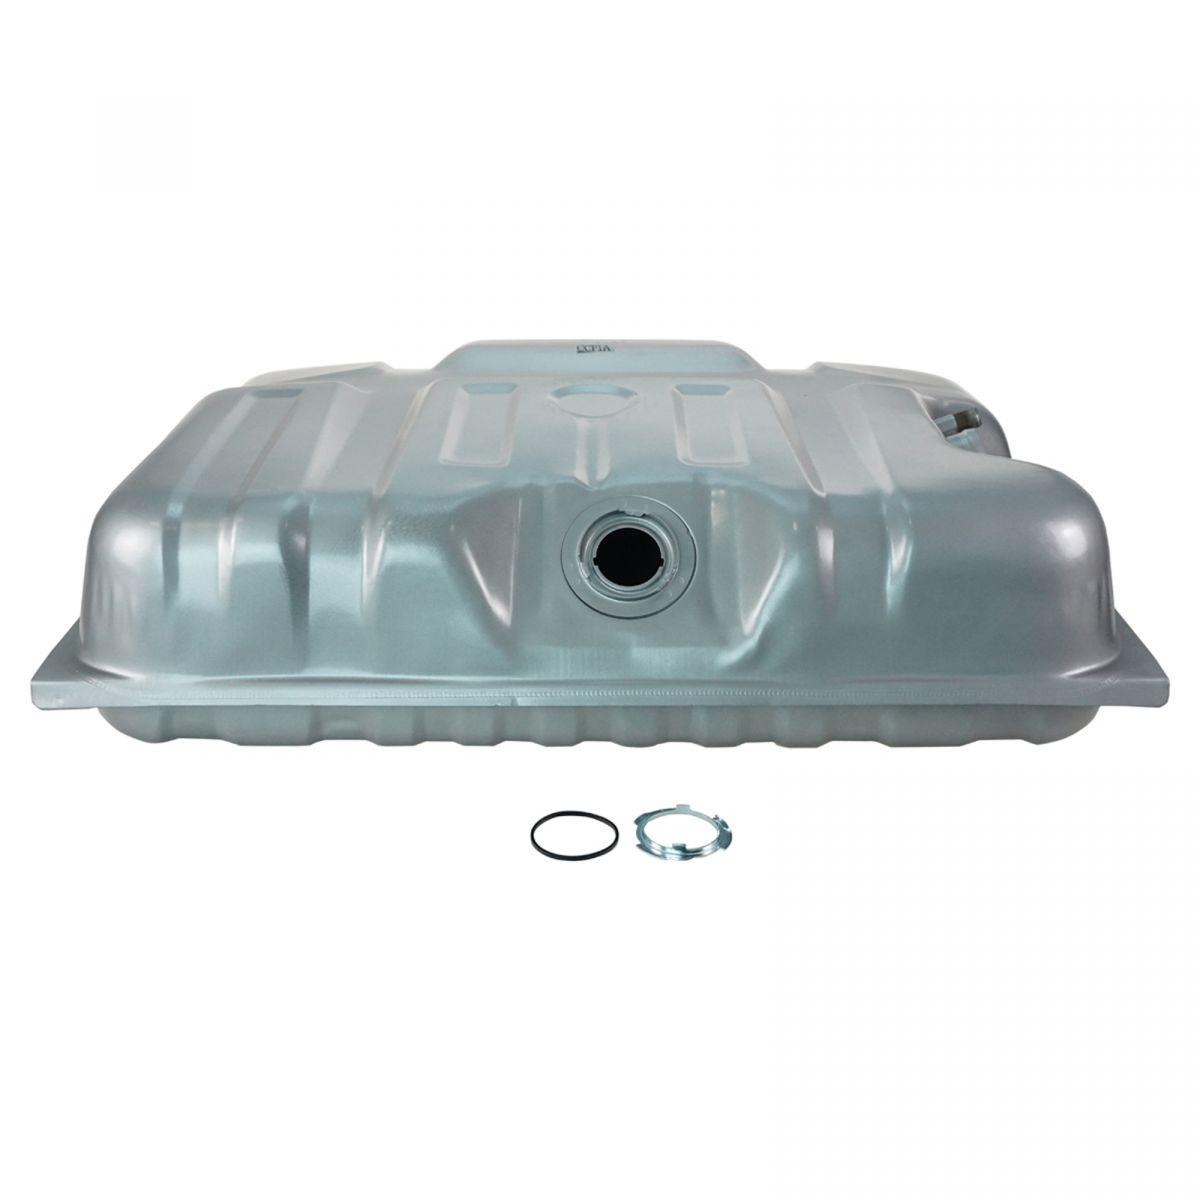 gas fuel tank 19 gallon rear mount for 73 78 ford f100 f150 f250 f350 192659257161 ebay. Black Bedroom Furniture Sets. Home Design Ideas